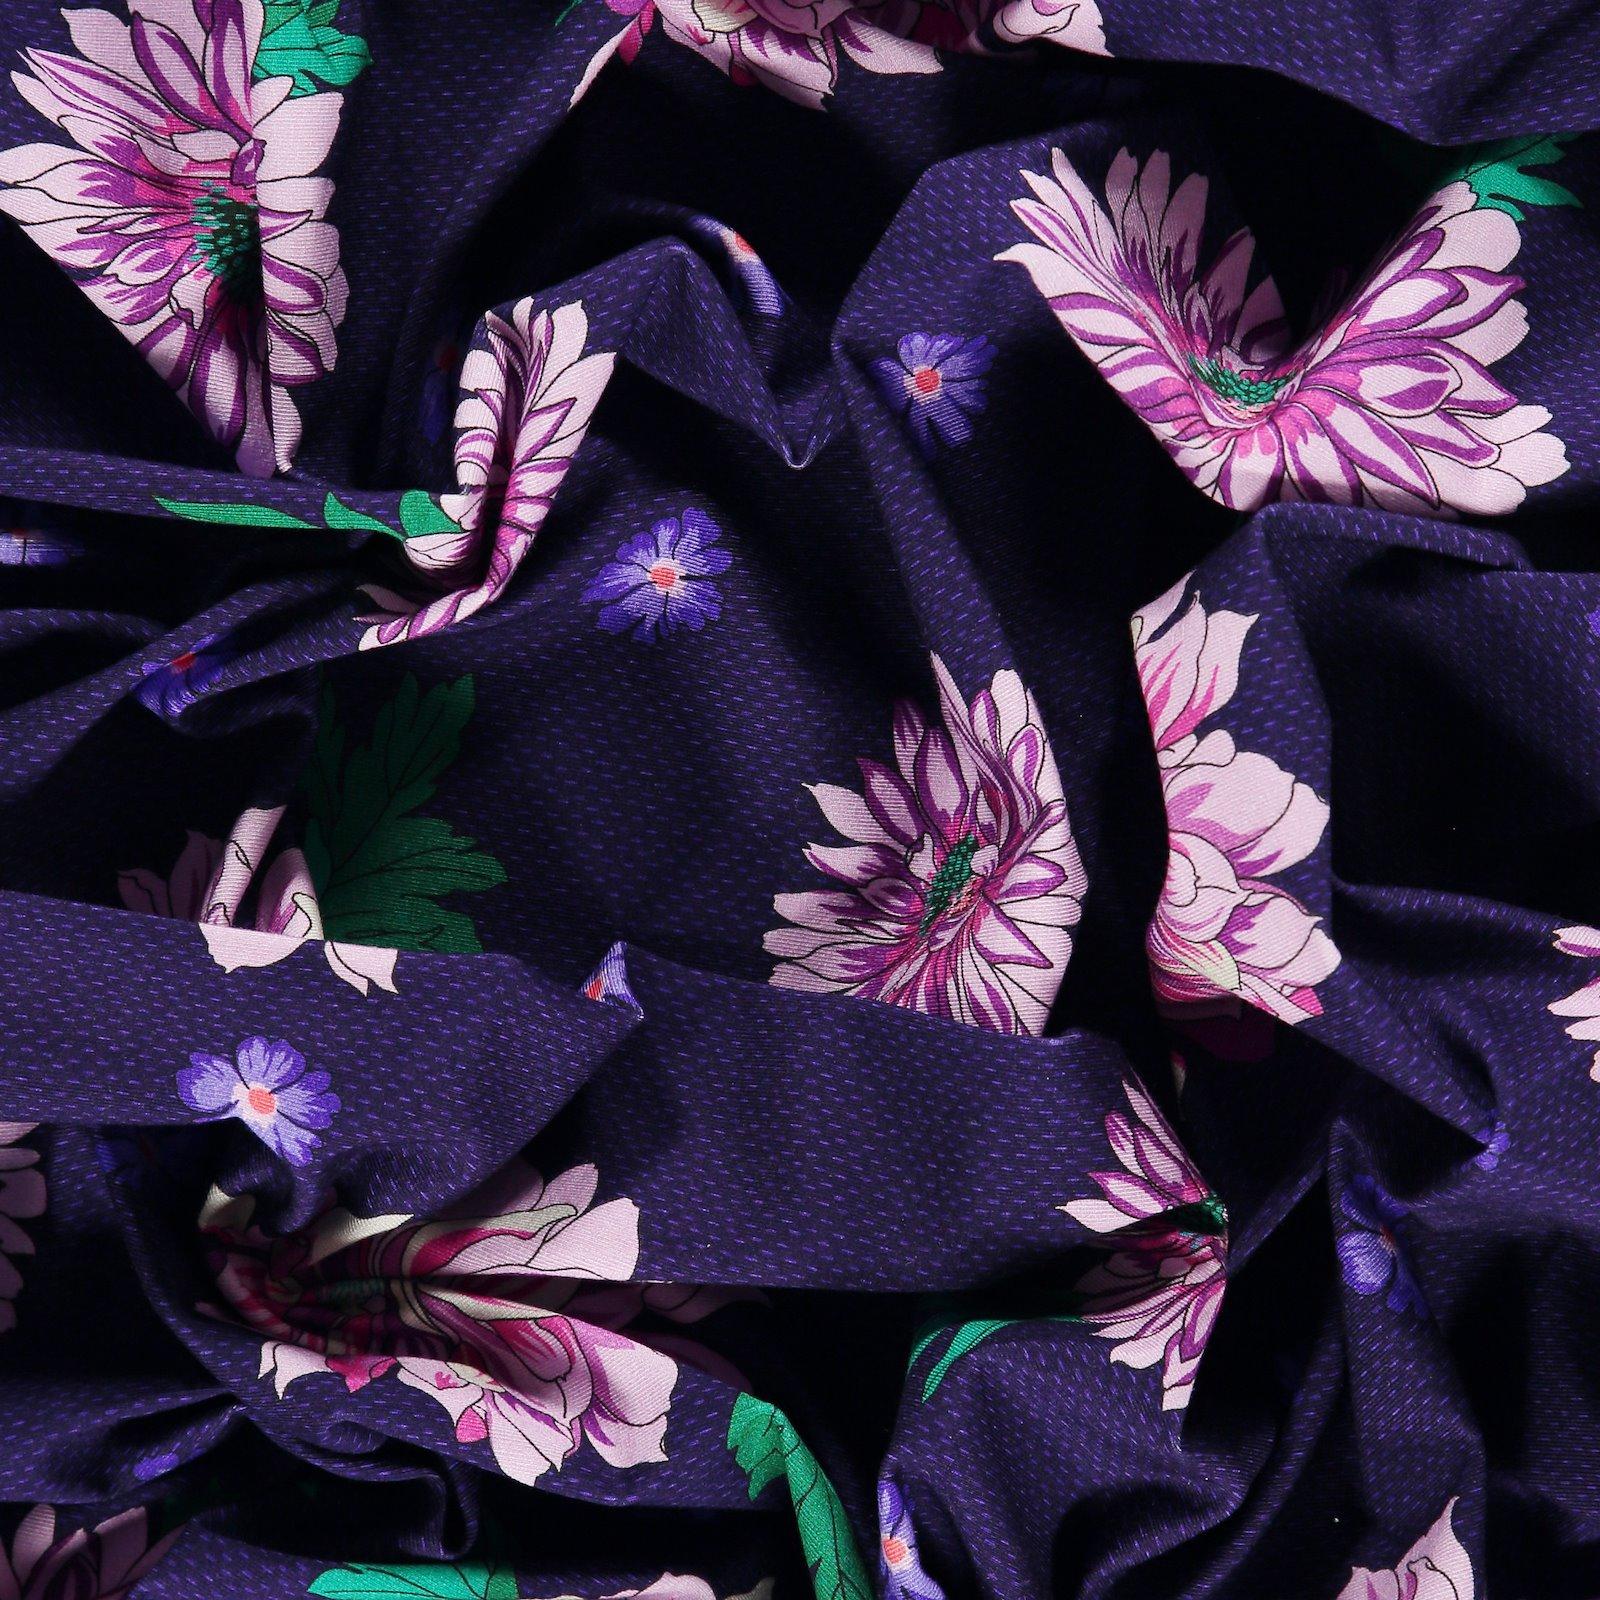 Viscose stretch jersey navy with flower